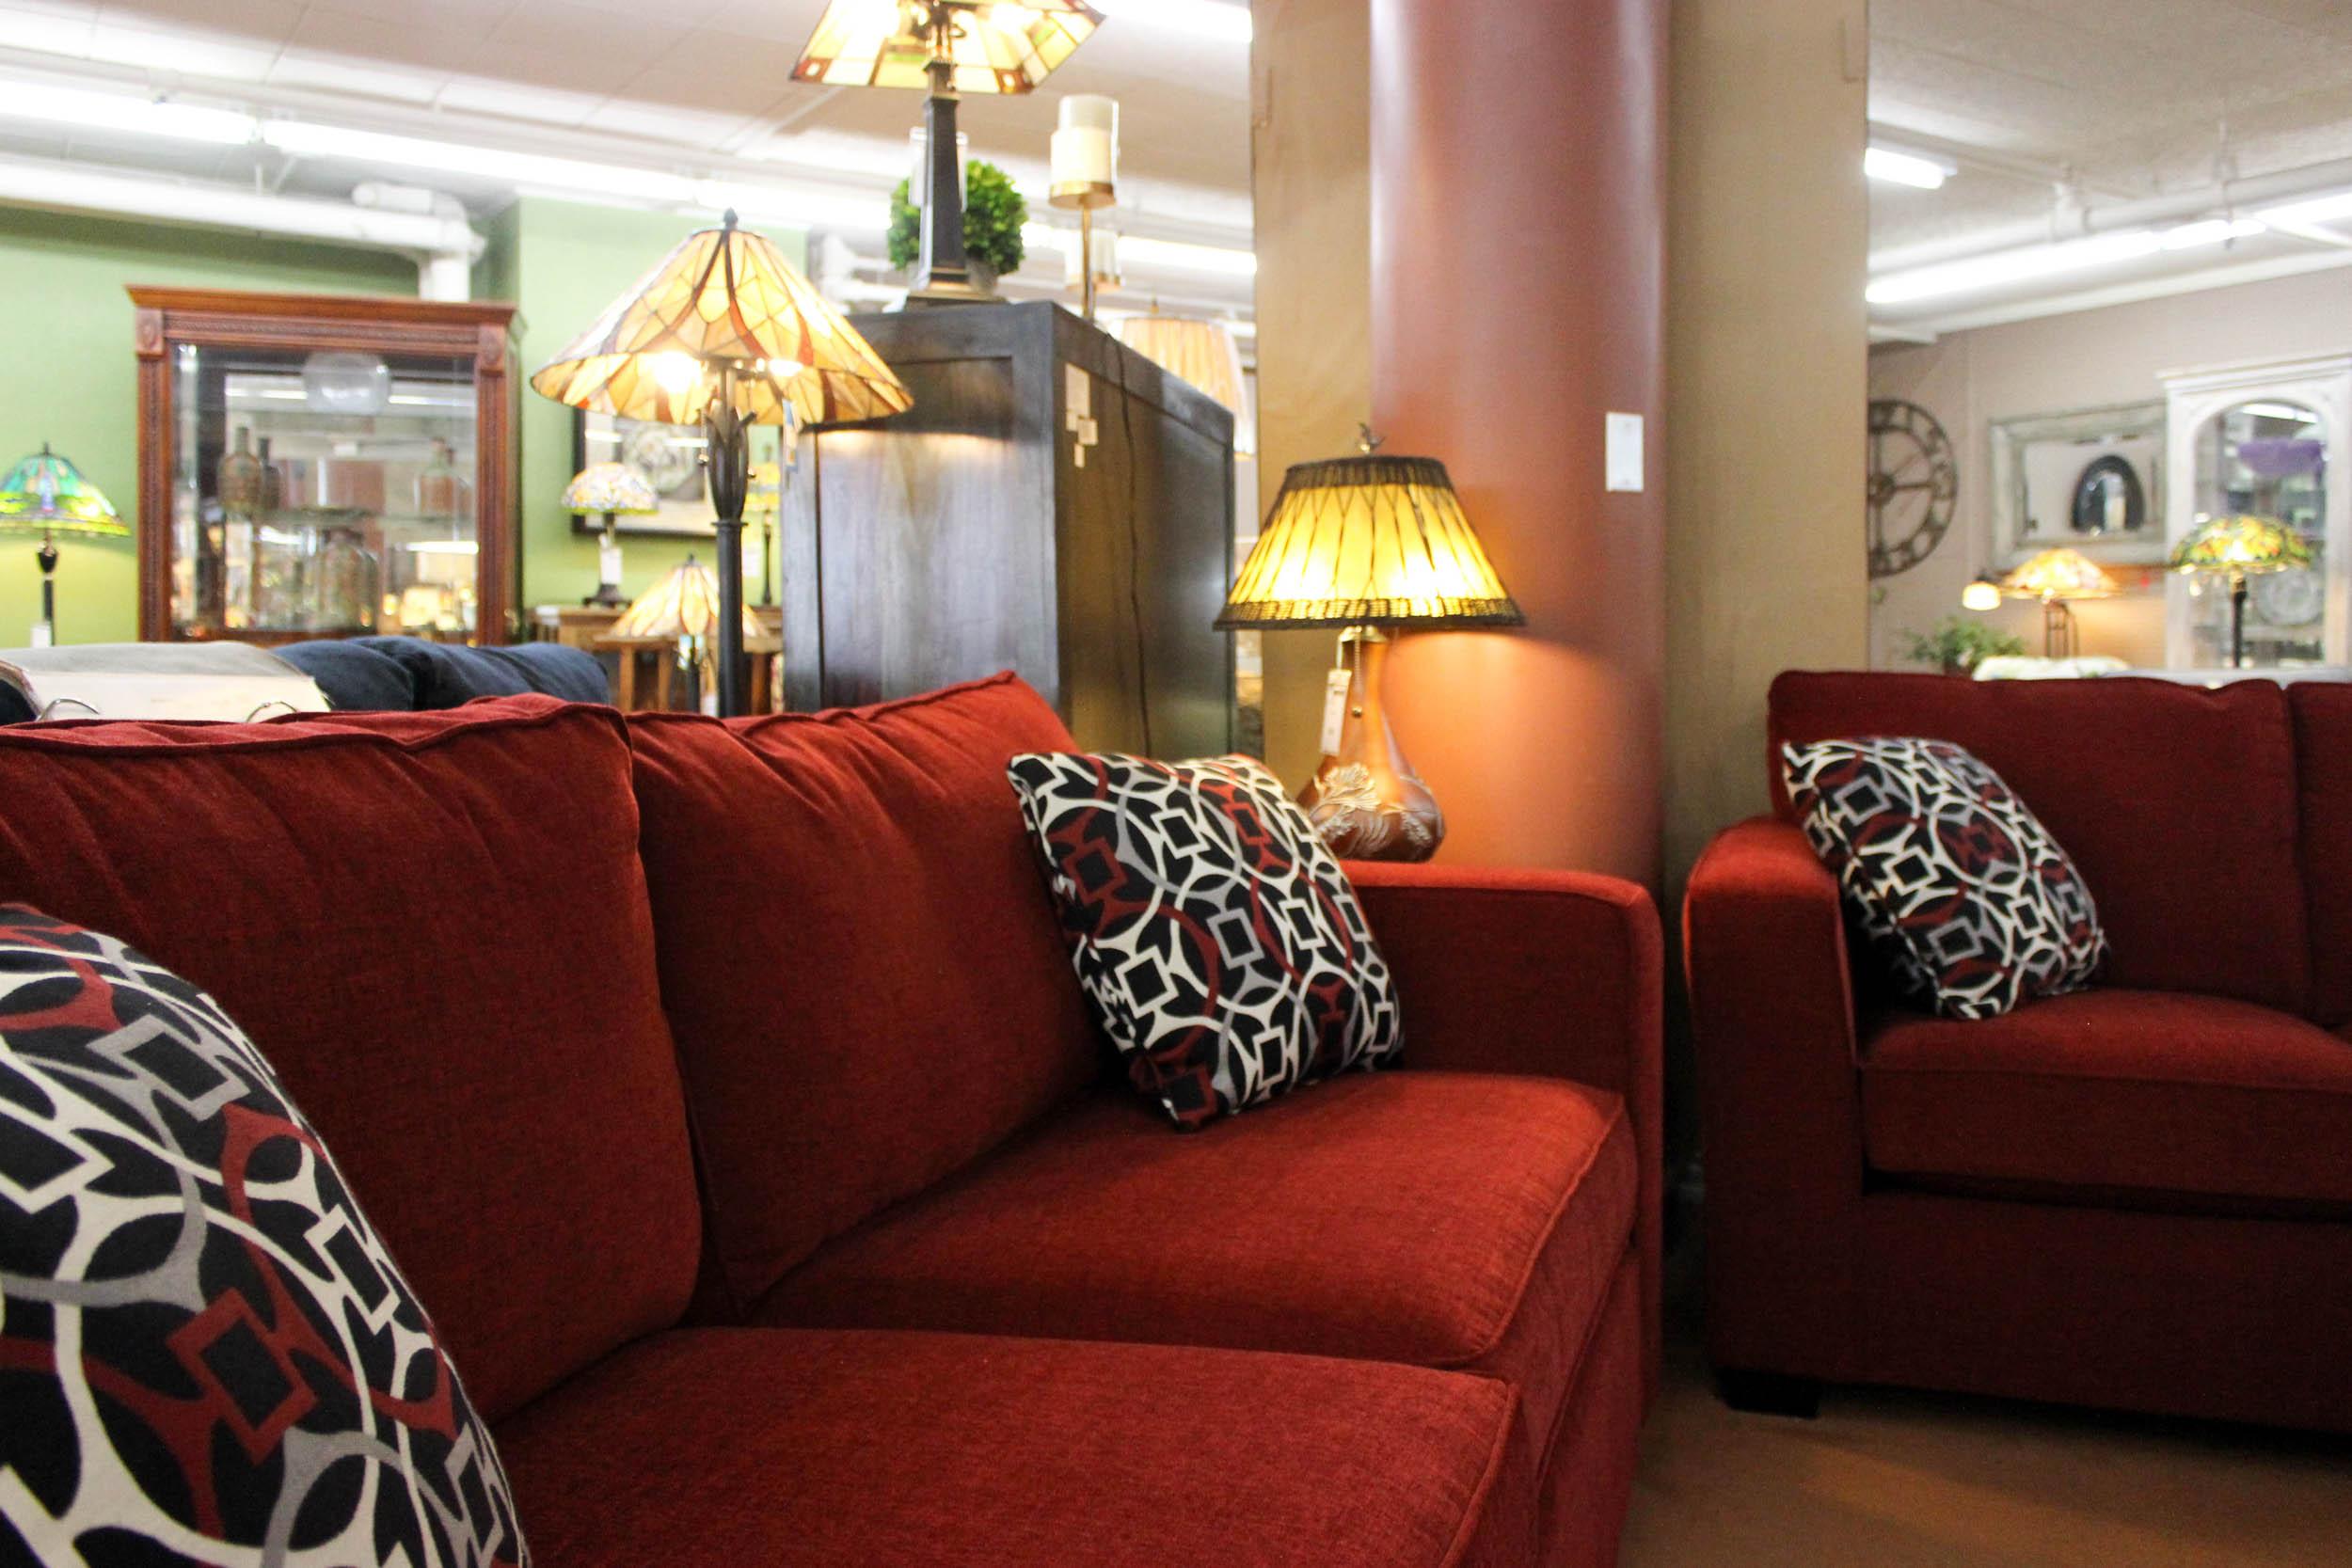 swivel chair nebraska furniture mart design sketch stationary and chairs